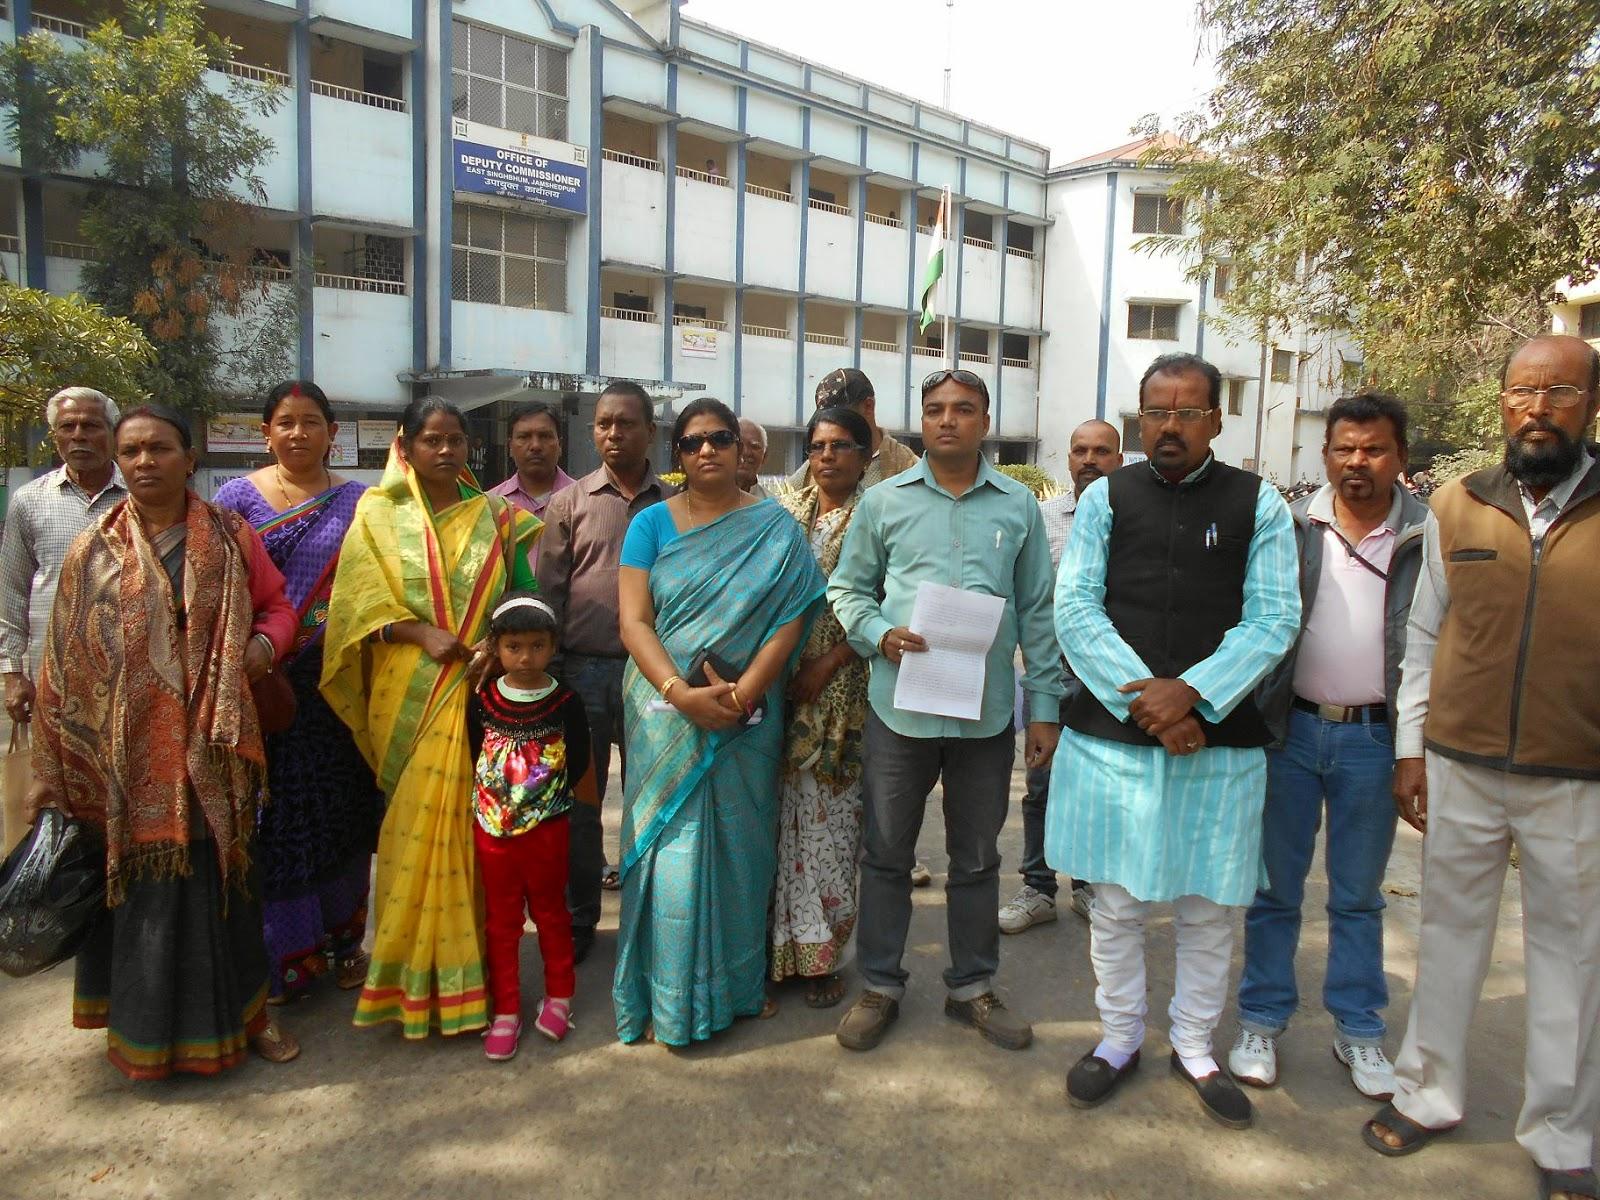 kamal singh, MLM NEWS, MLM hindi news, jadugoda, raj com, raj group chitfund,